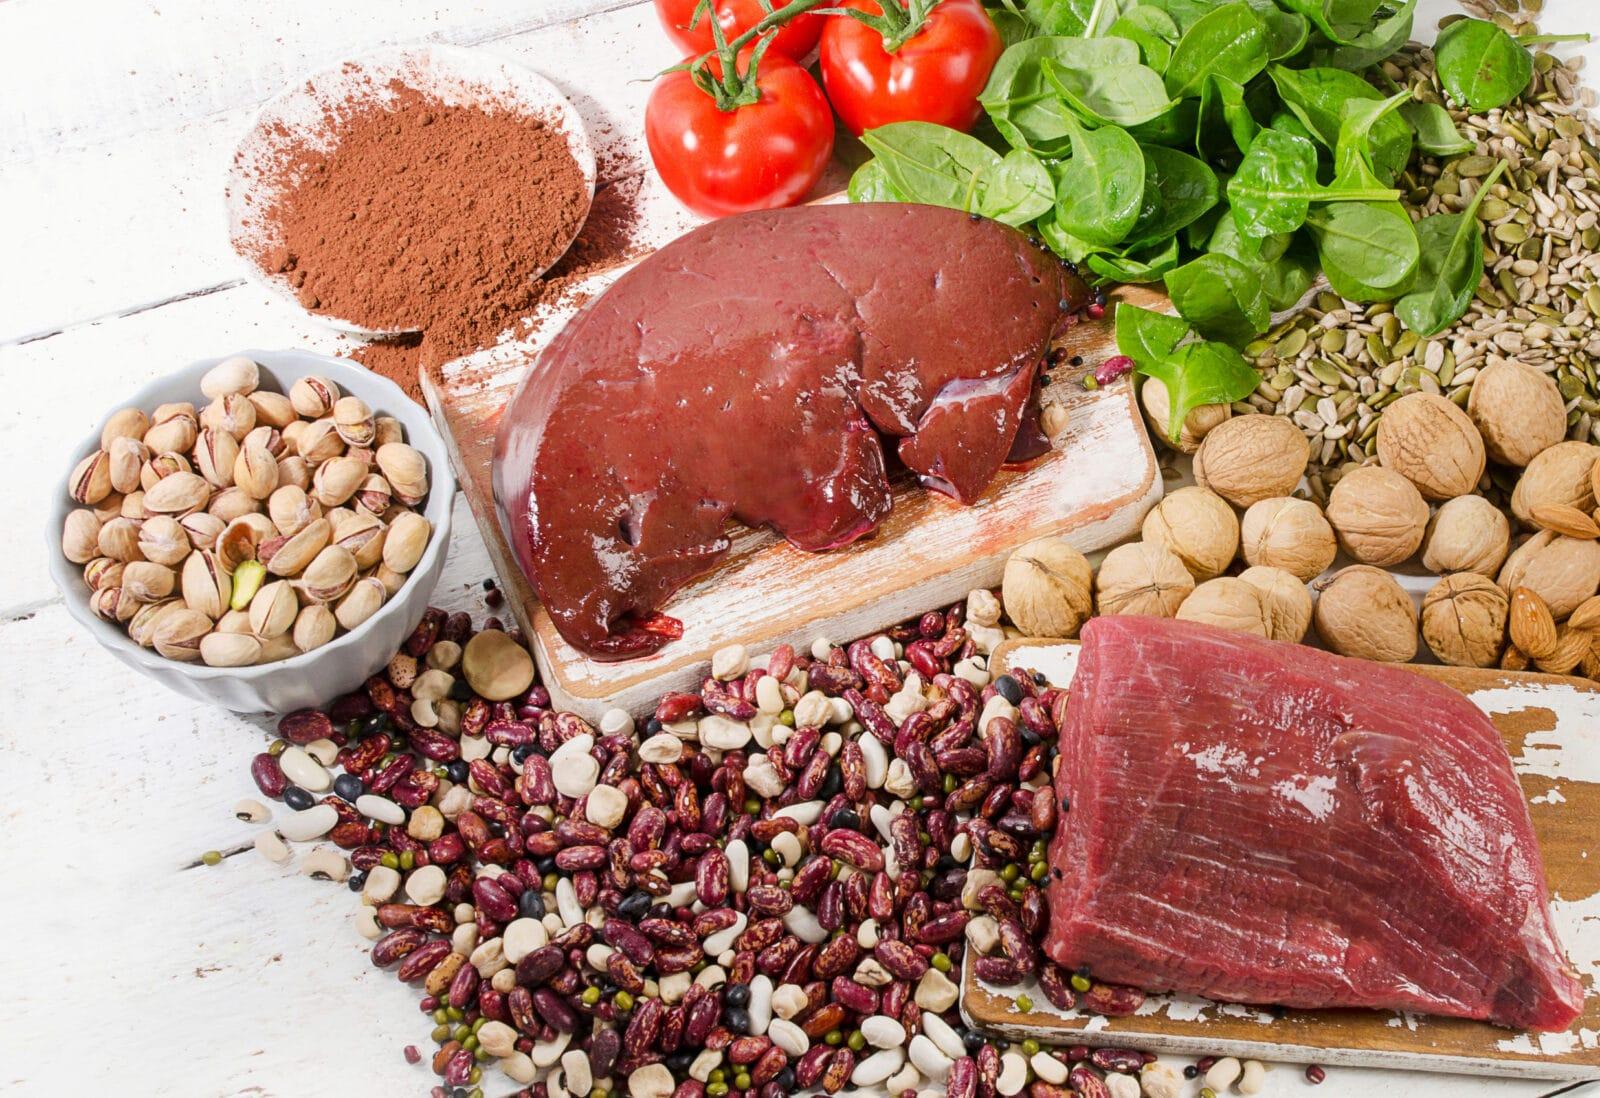 zdrowa dieta bogata w żelazo